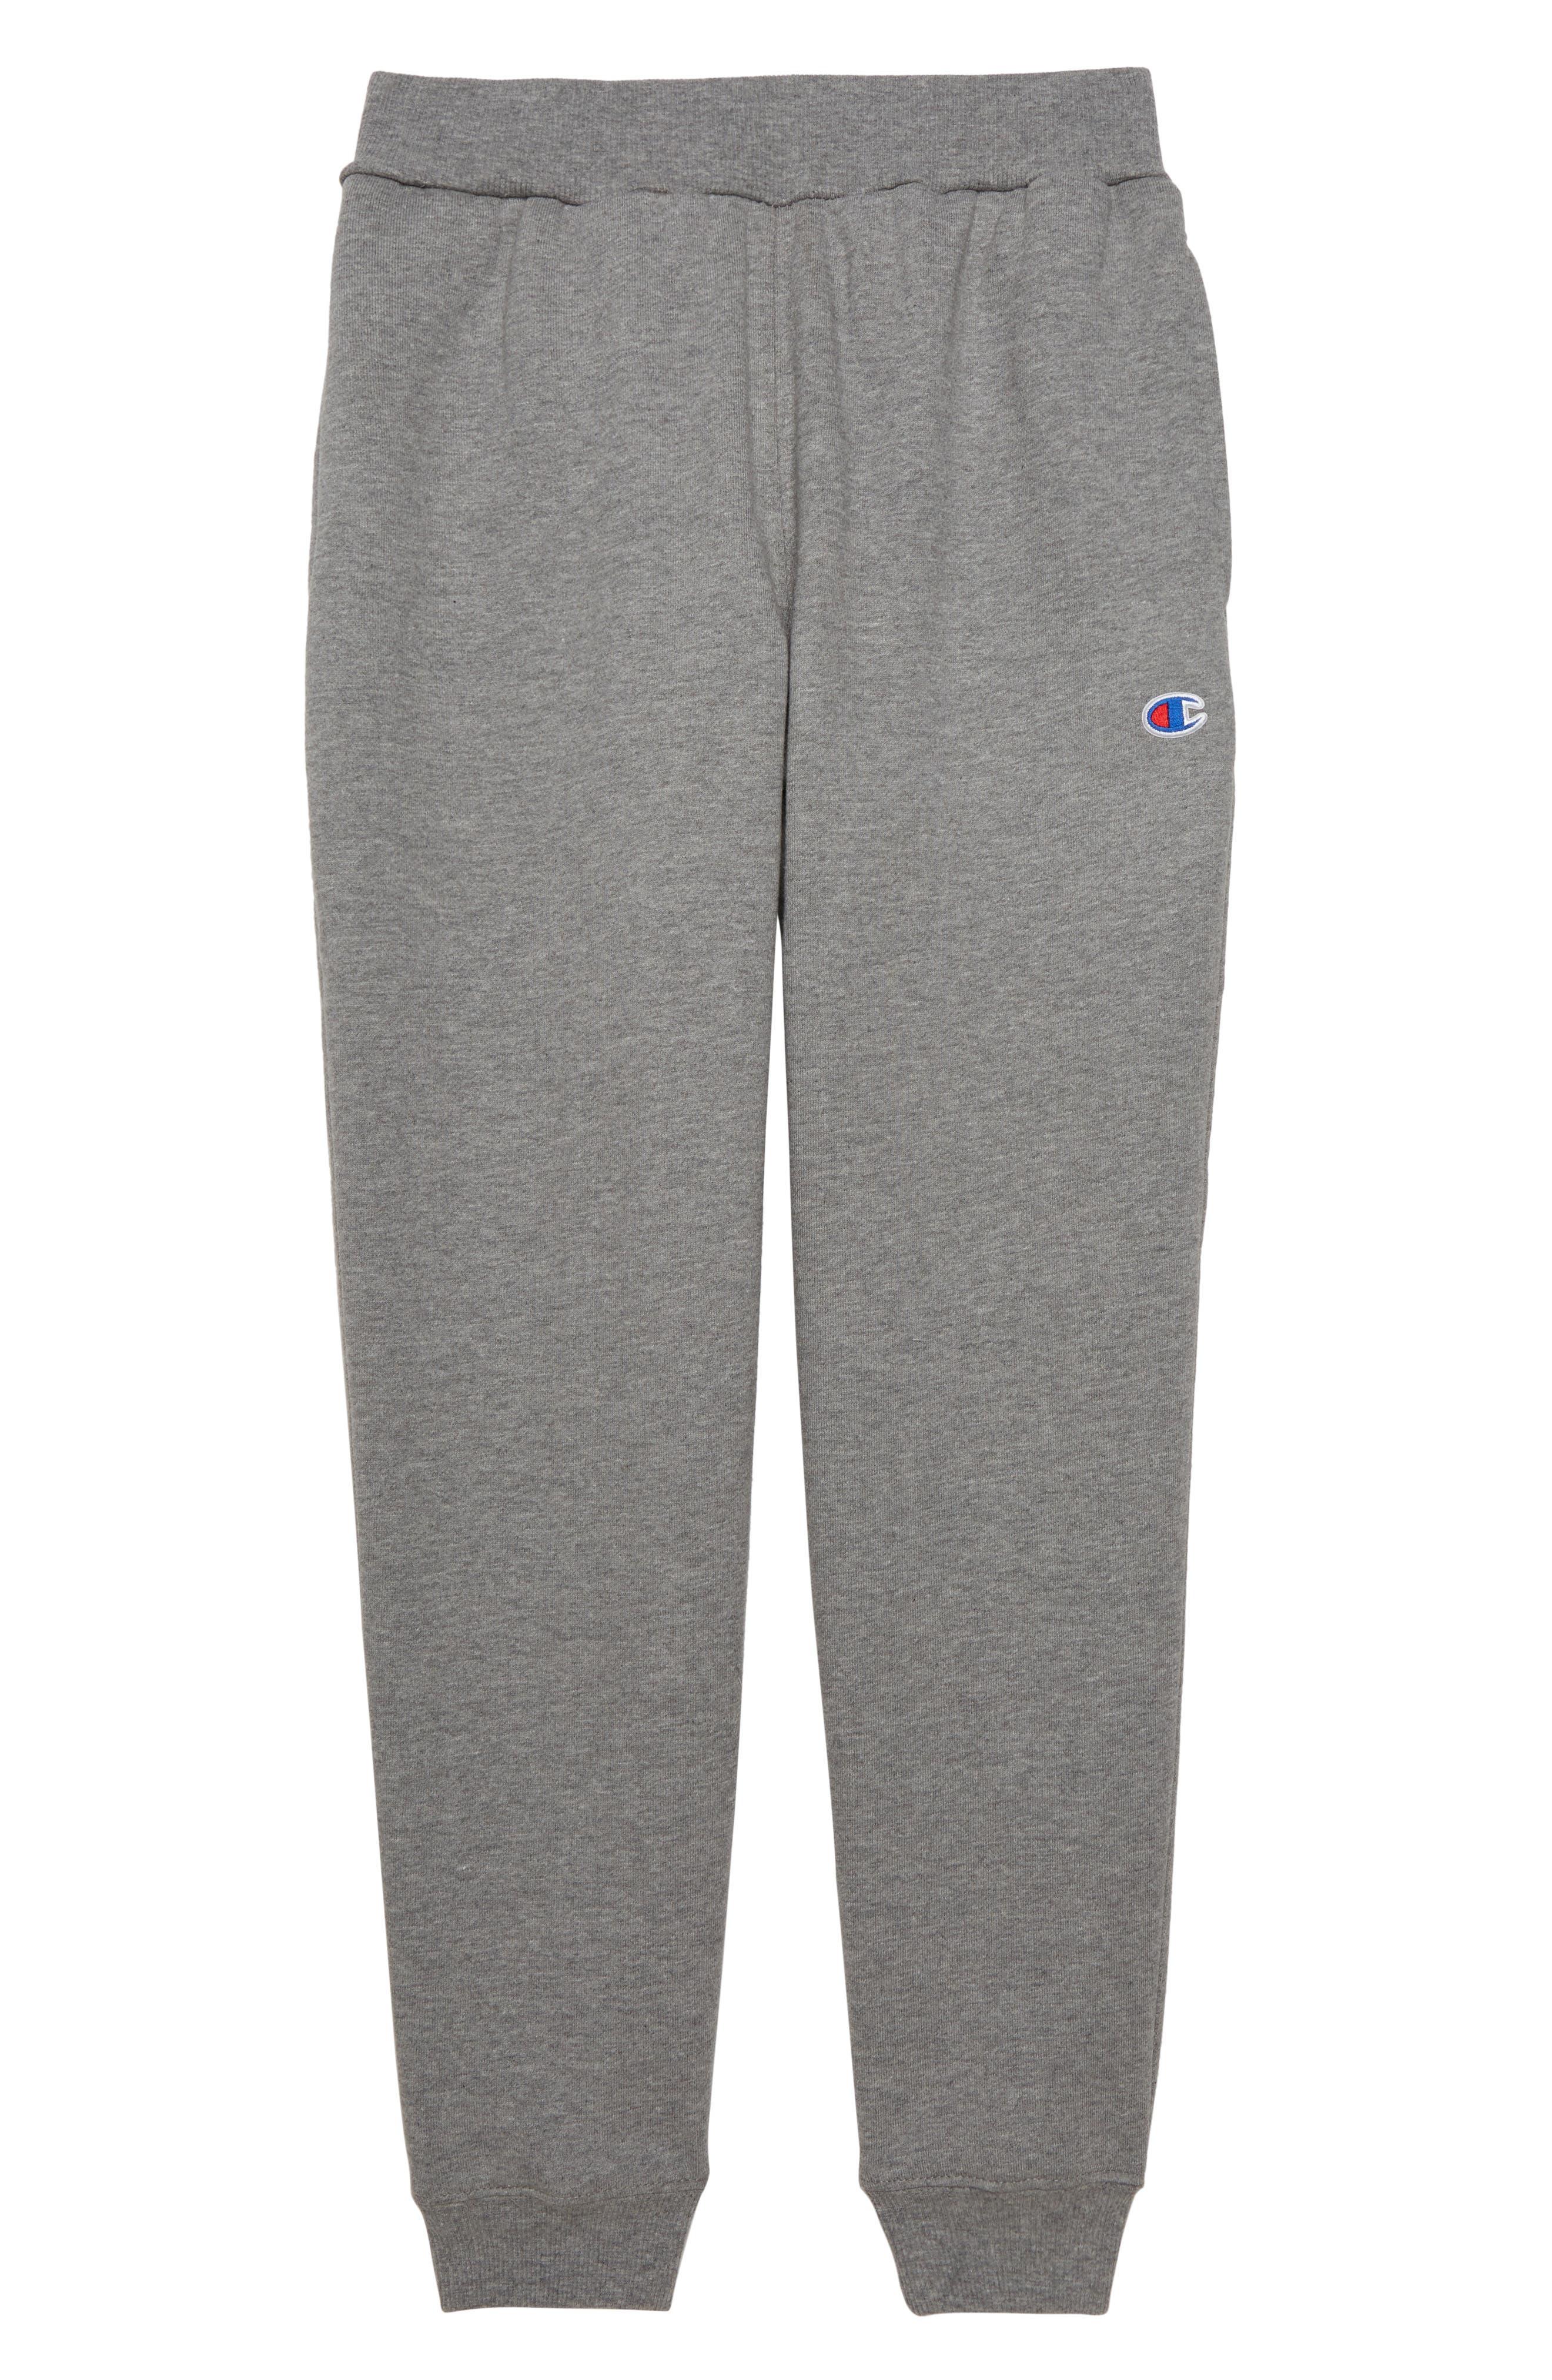 CHAMPION Reverse Weave Jogger Pants, Main, color, OXFORD HEATHER